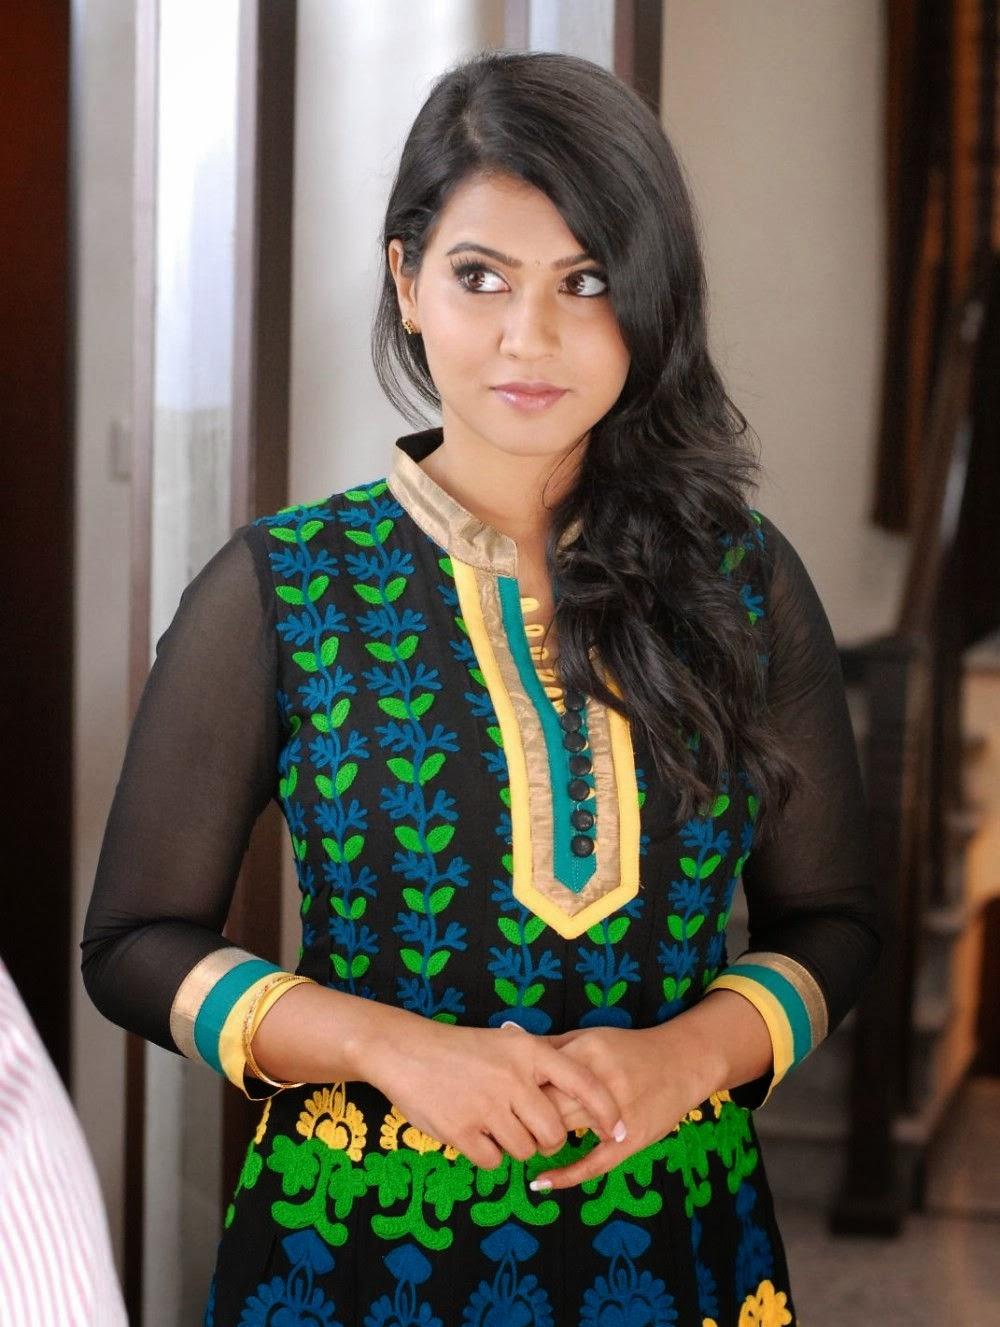 Sharmila mandre latest photos in salwar kameez